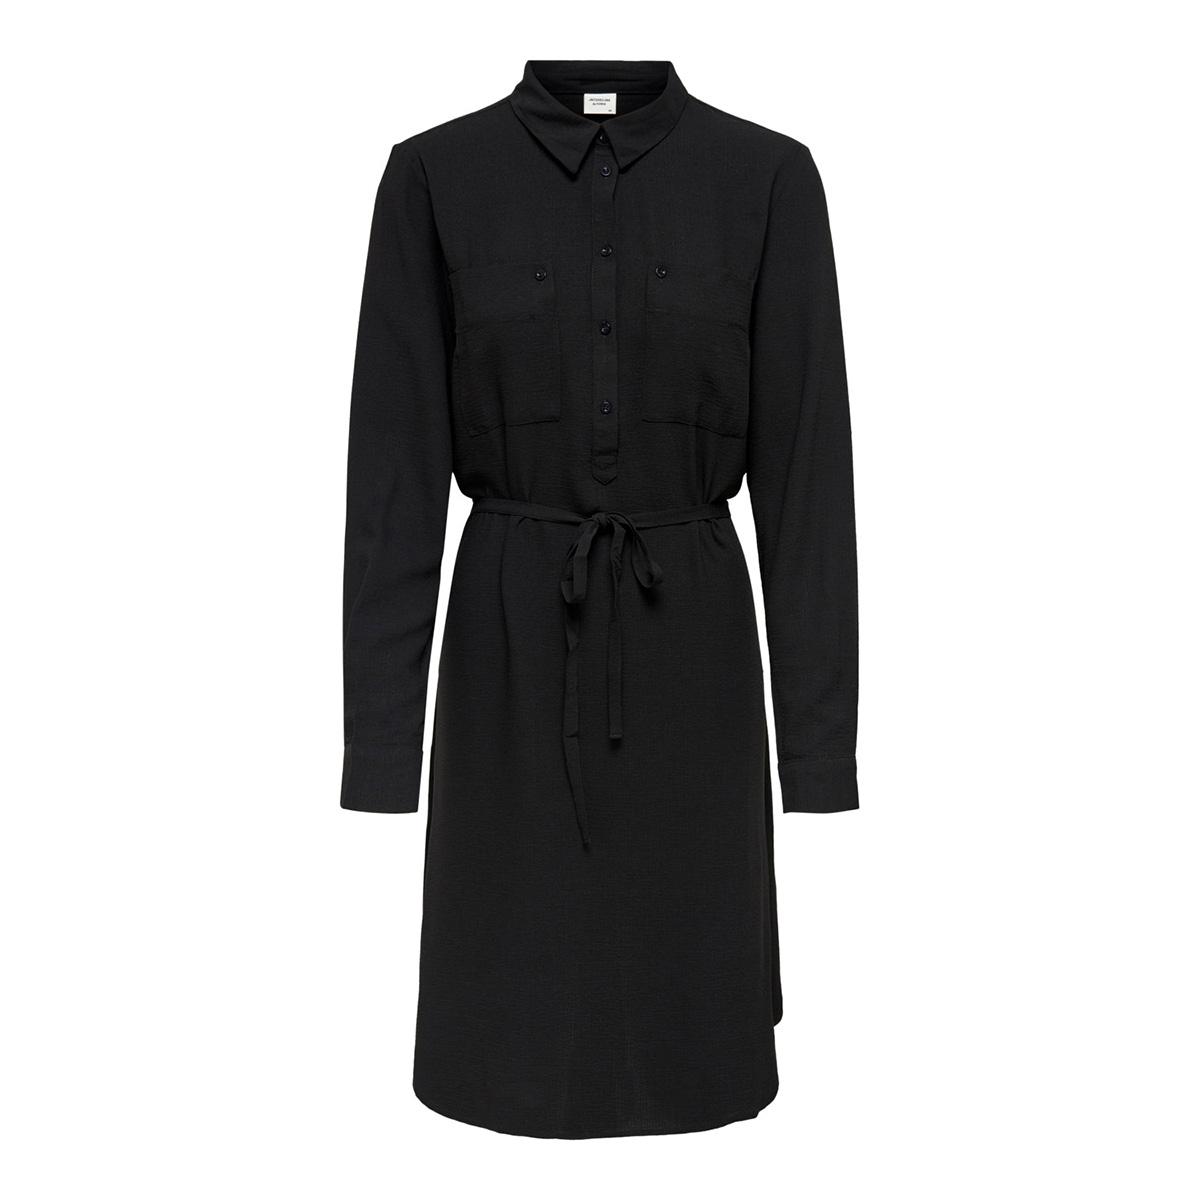 jdypaul l/s shirt dress wvn 15192585 jacqueline de yong jurk black